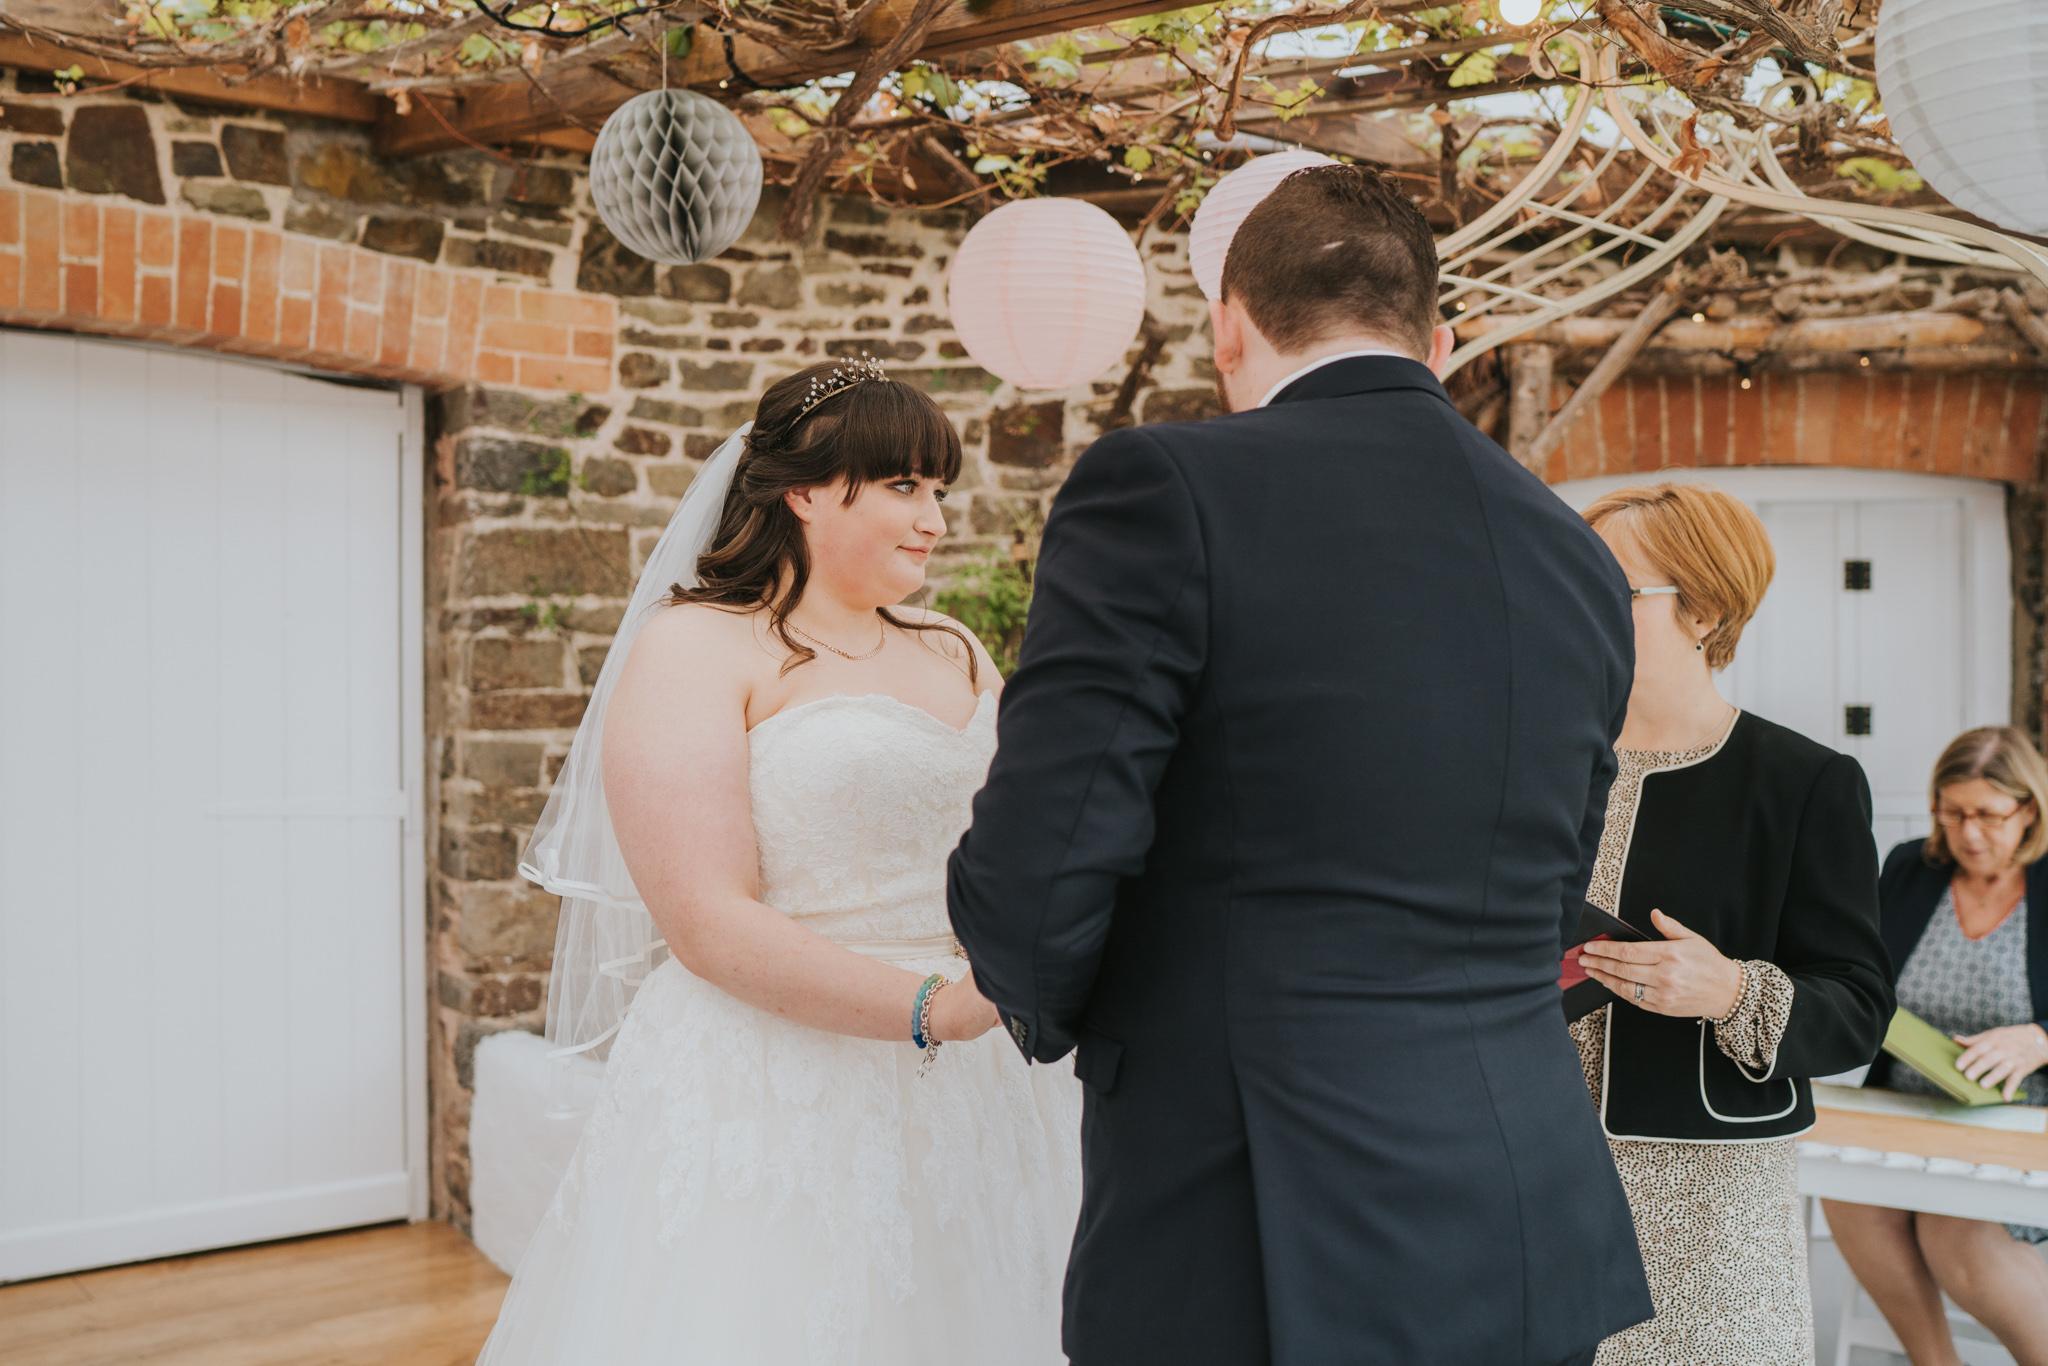 grace-sam-old-barn-clovelly-devon-wedding-photographer-grace-elizabeth-essex-suffolk-norfolk-wedding-photographer (48 of 132).jpg